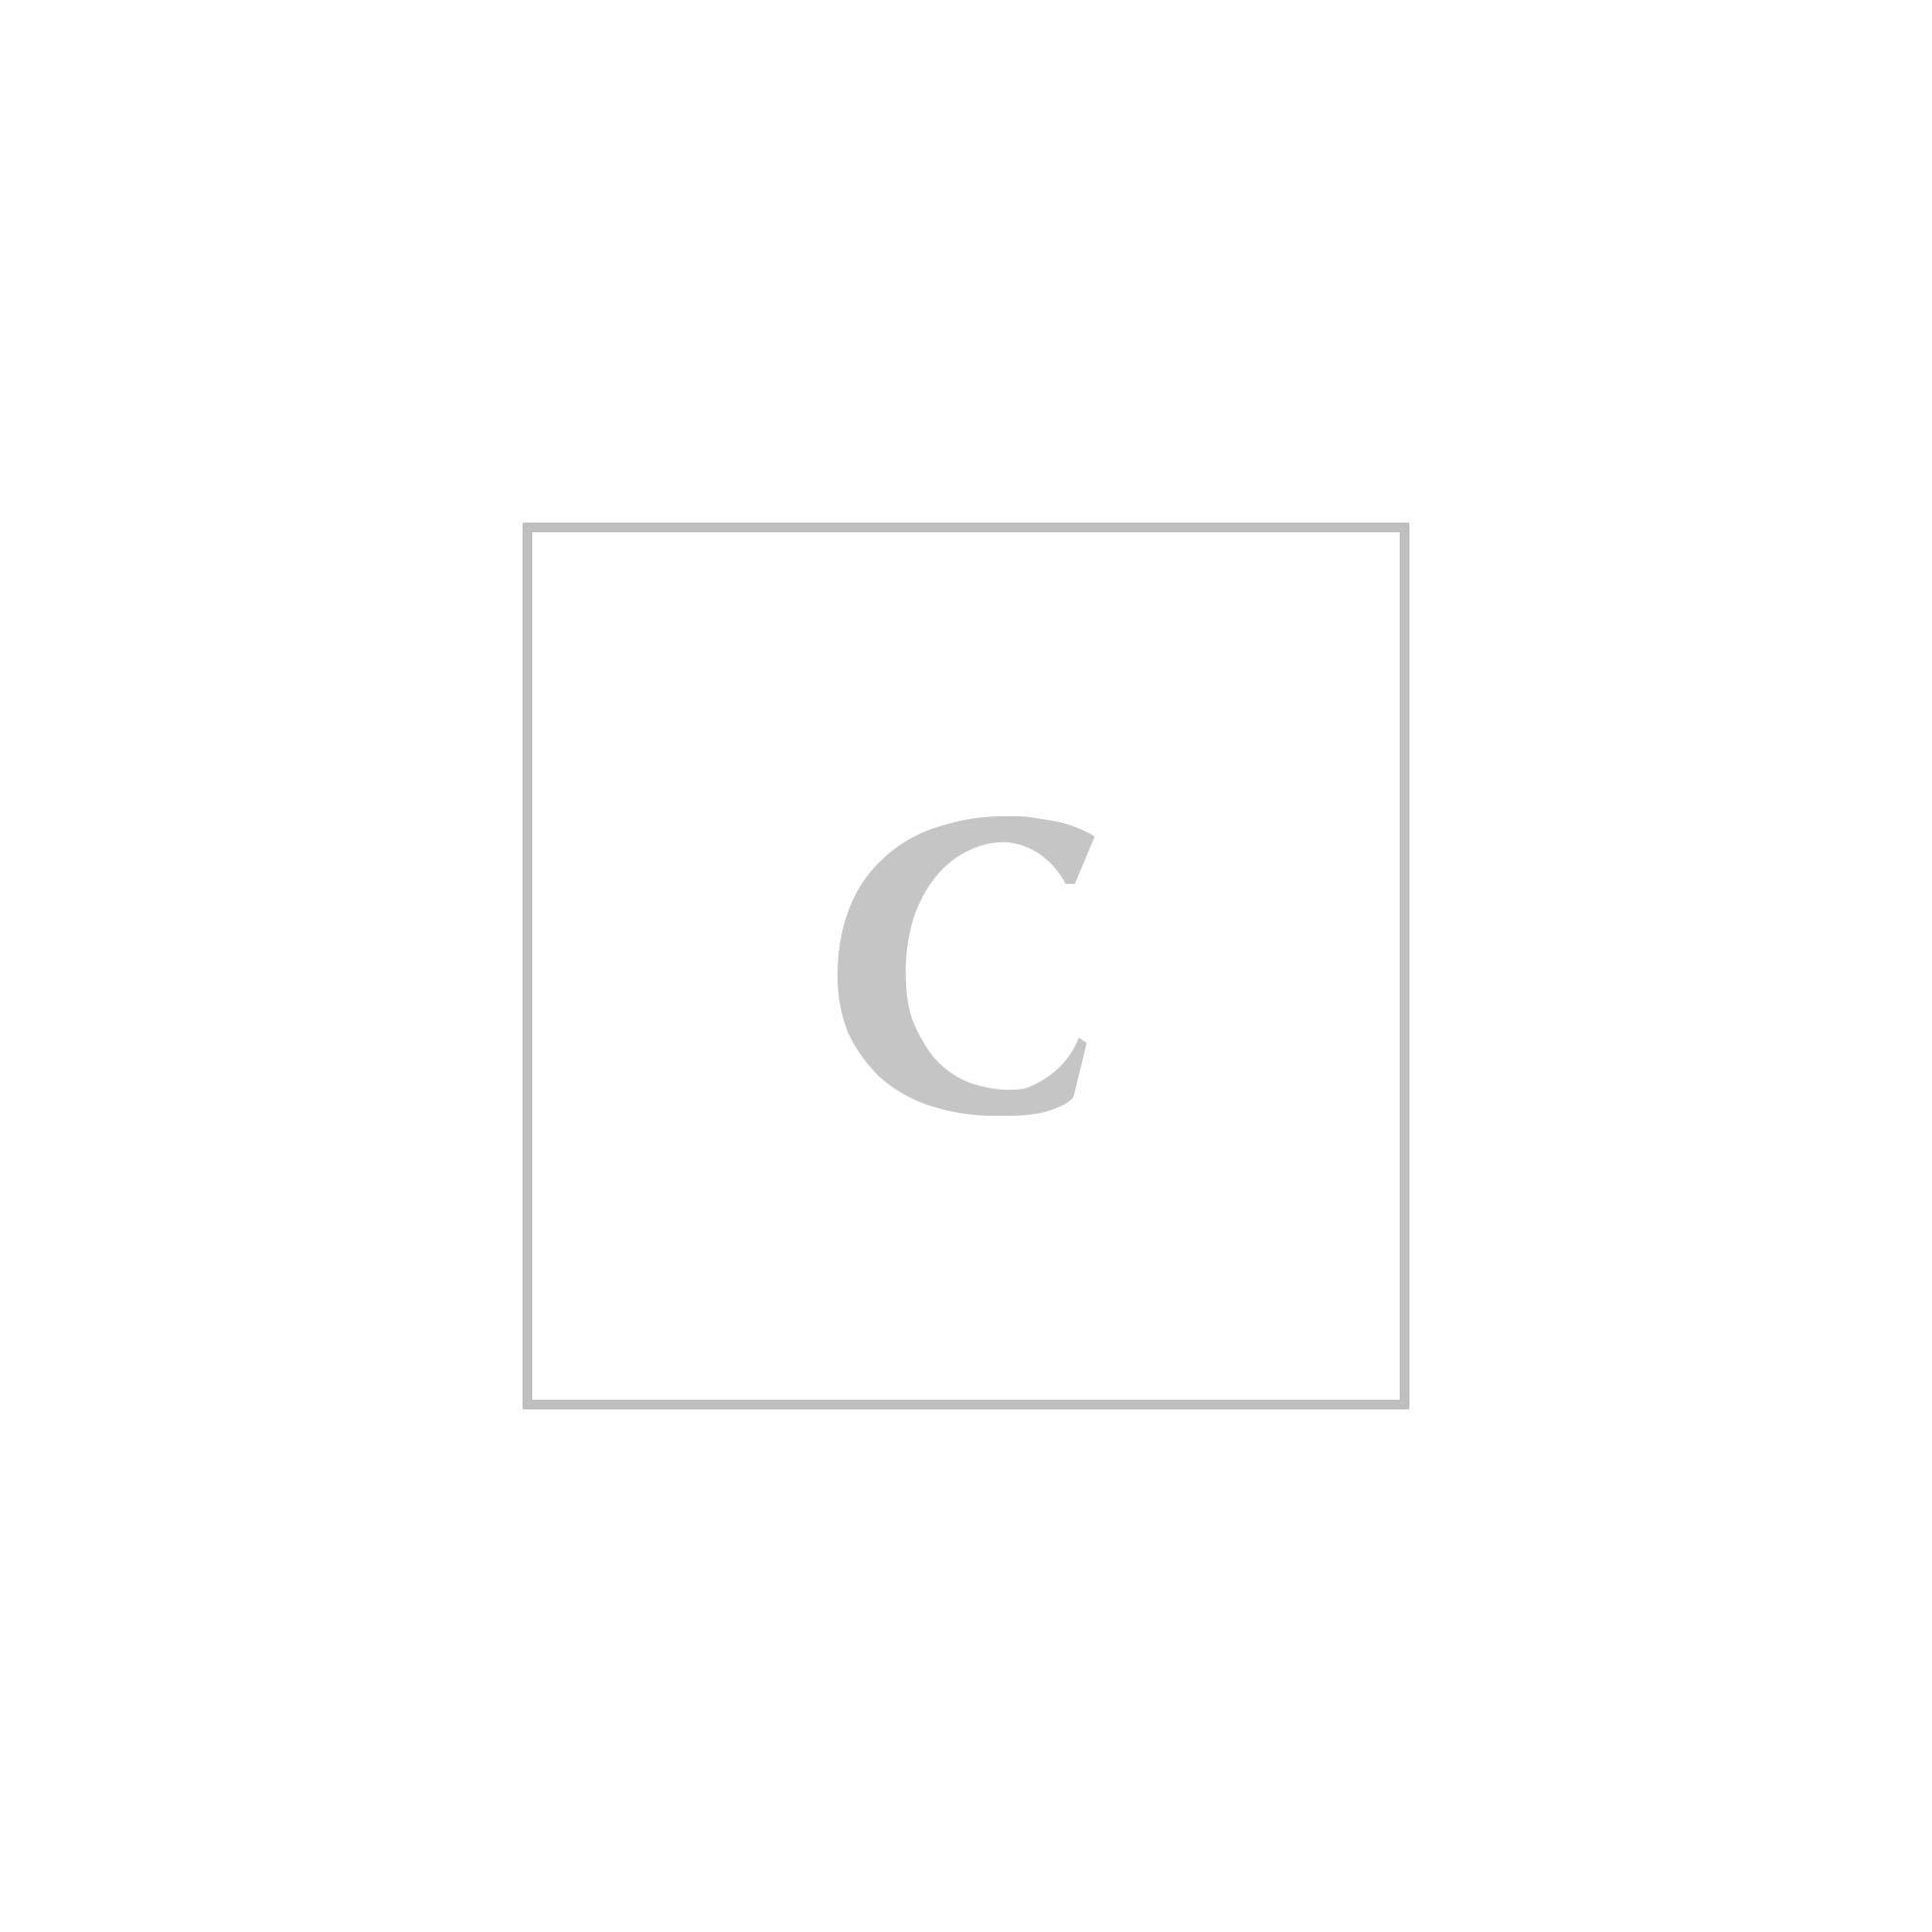 Moncler giacca rouillac